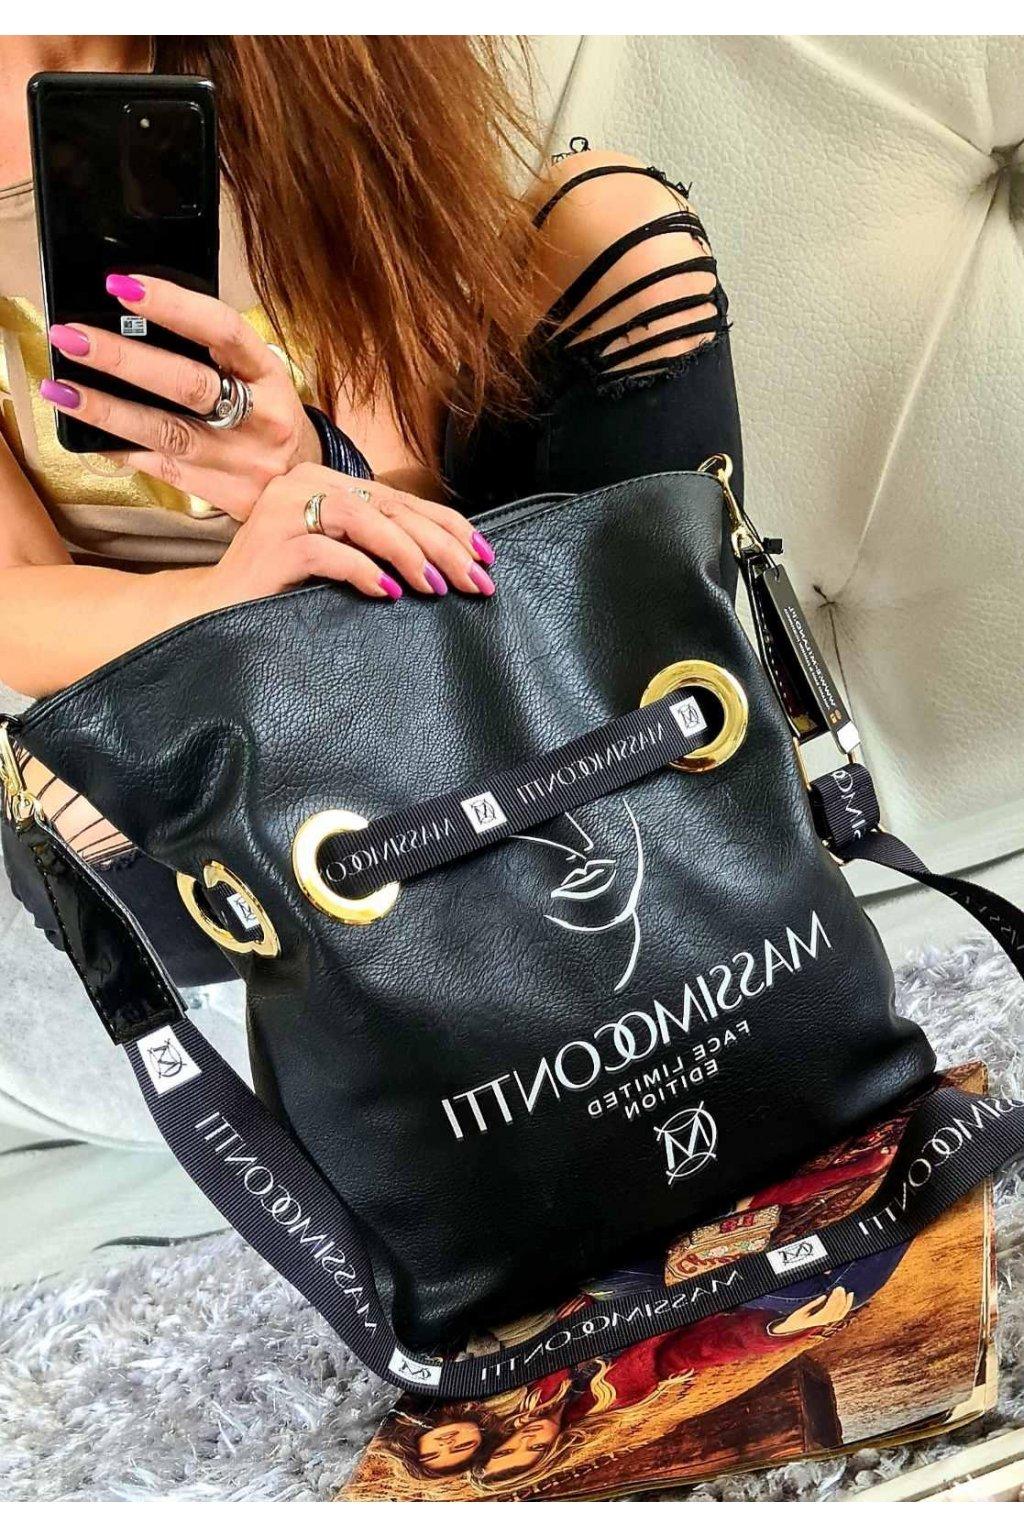 MASSIMO CONTTI vak černý style italy kabelka trendy